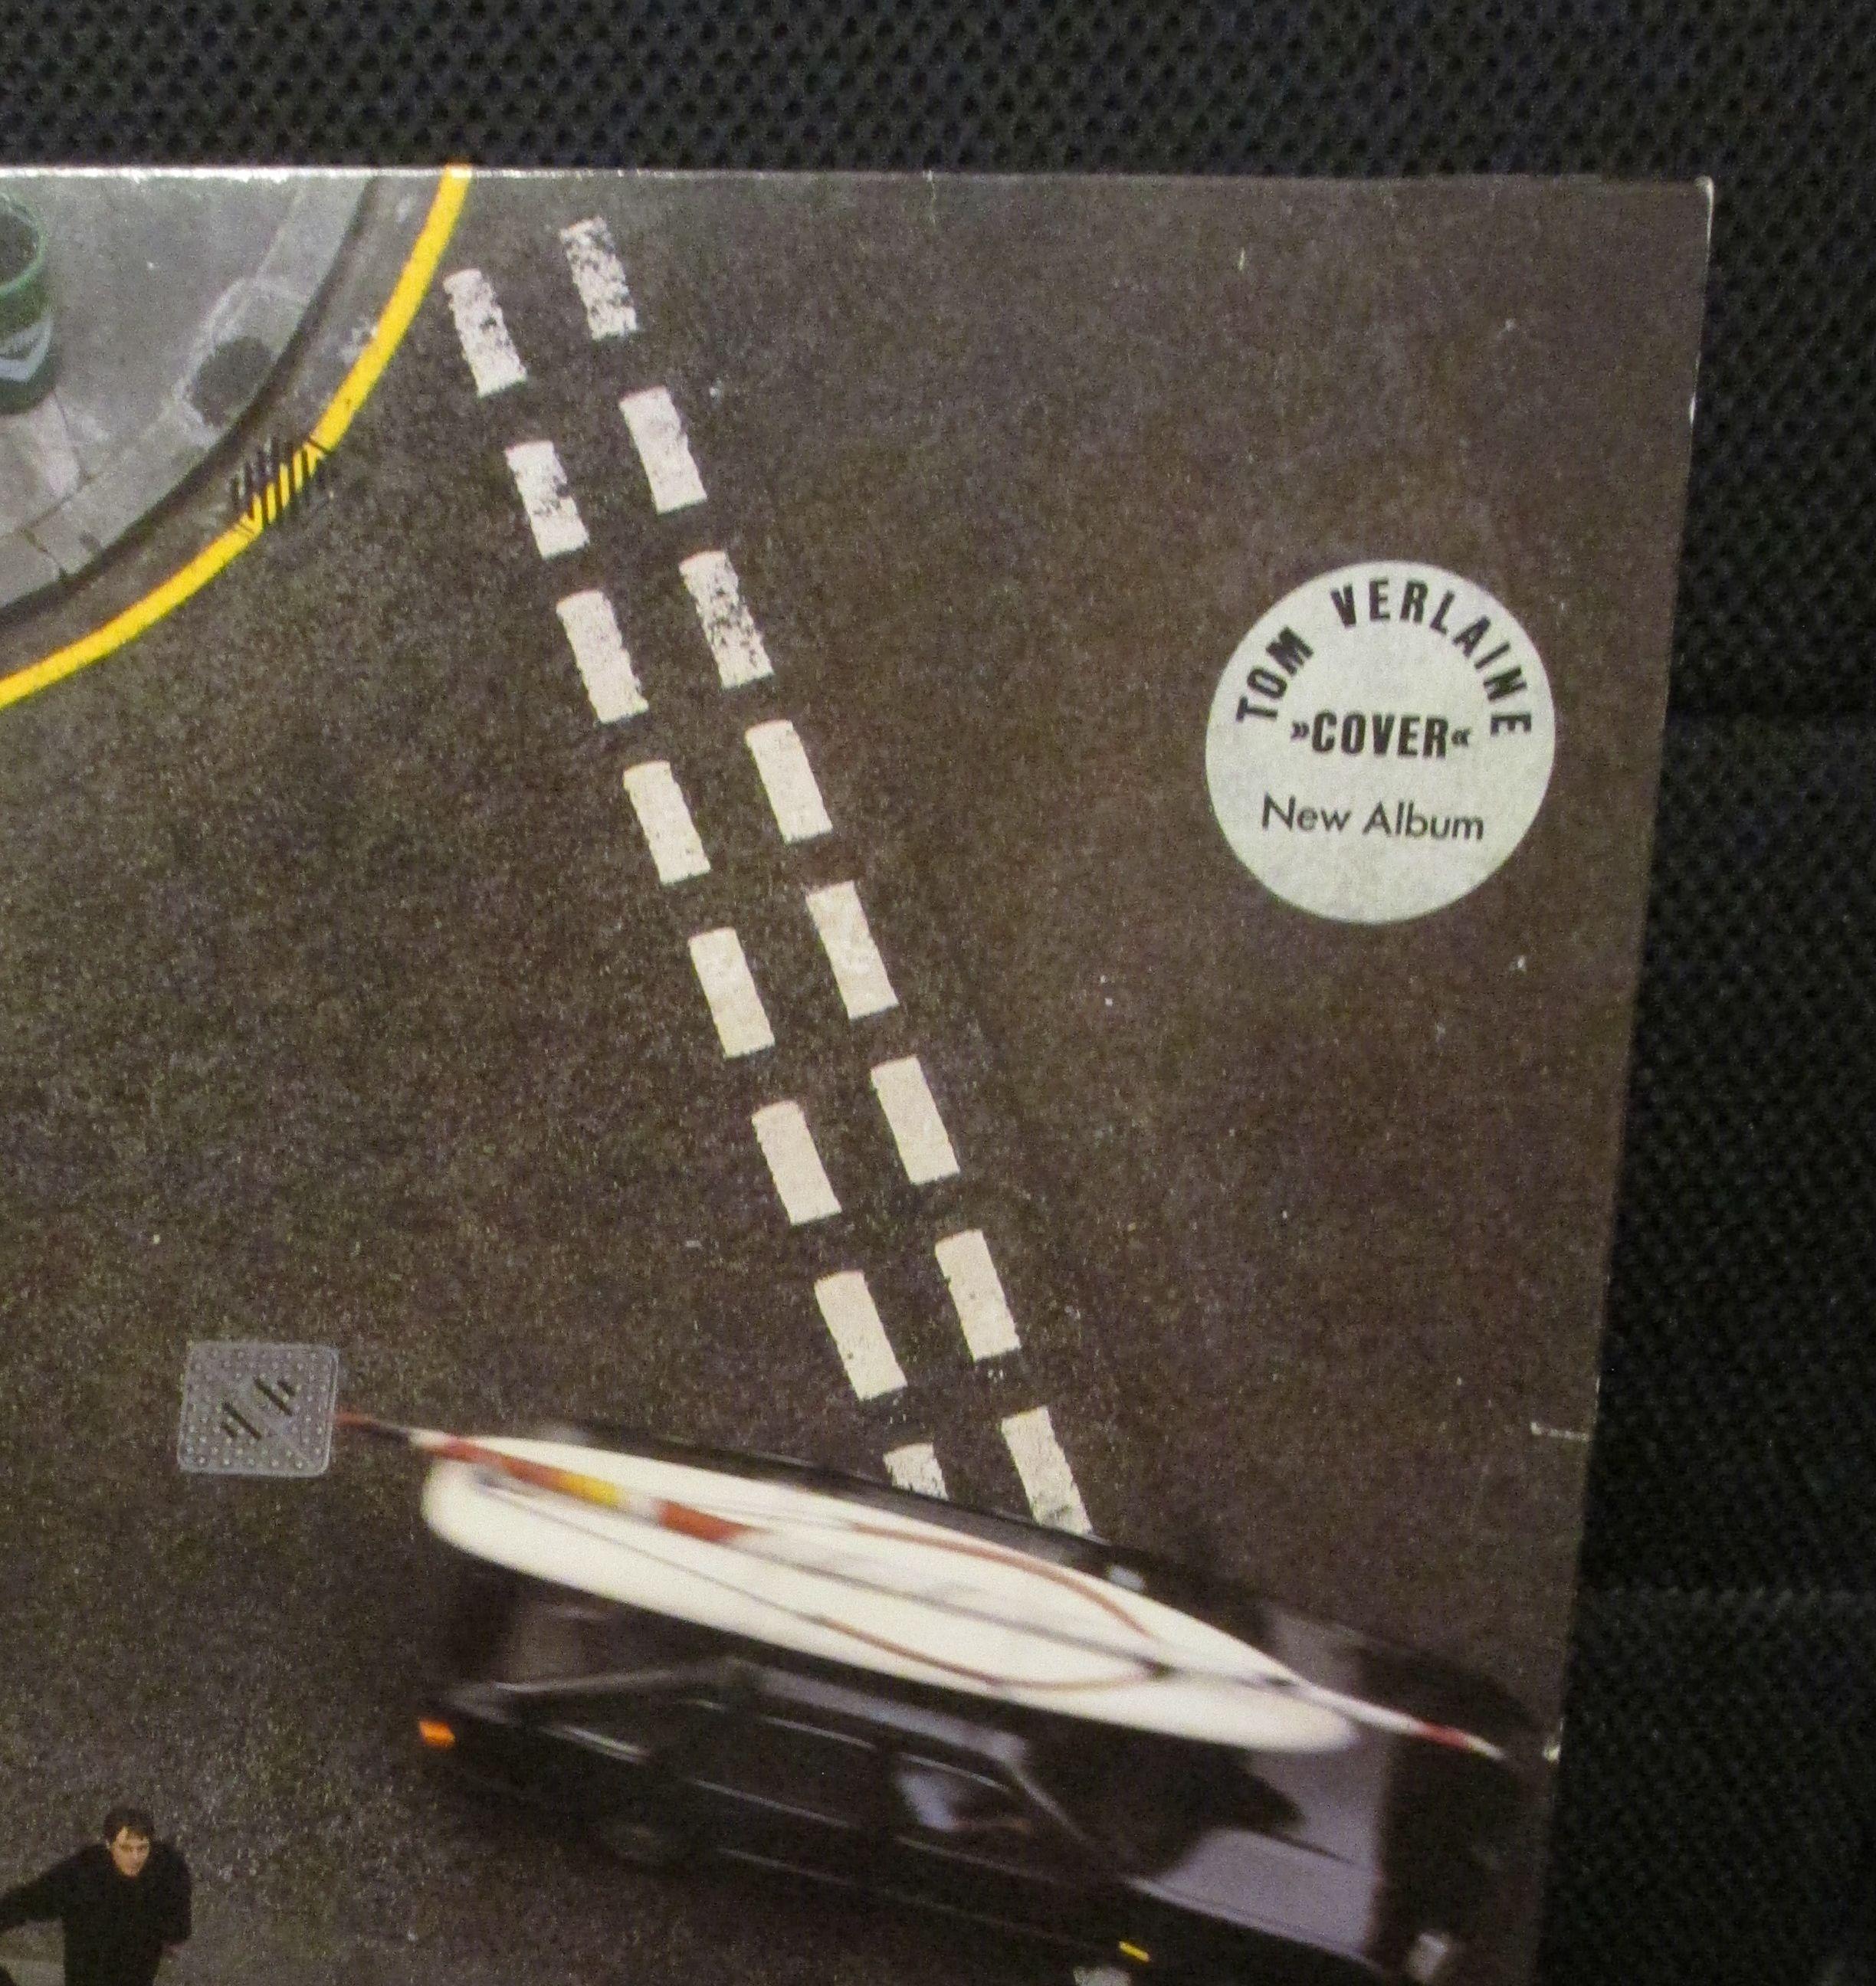 Tom Verlaine Cover LP undefined